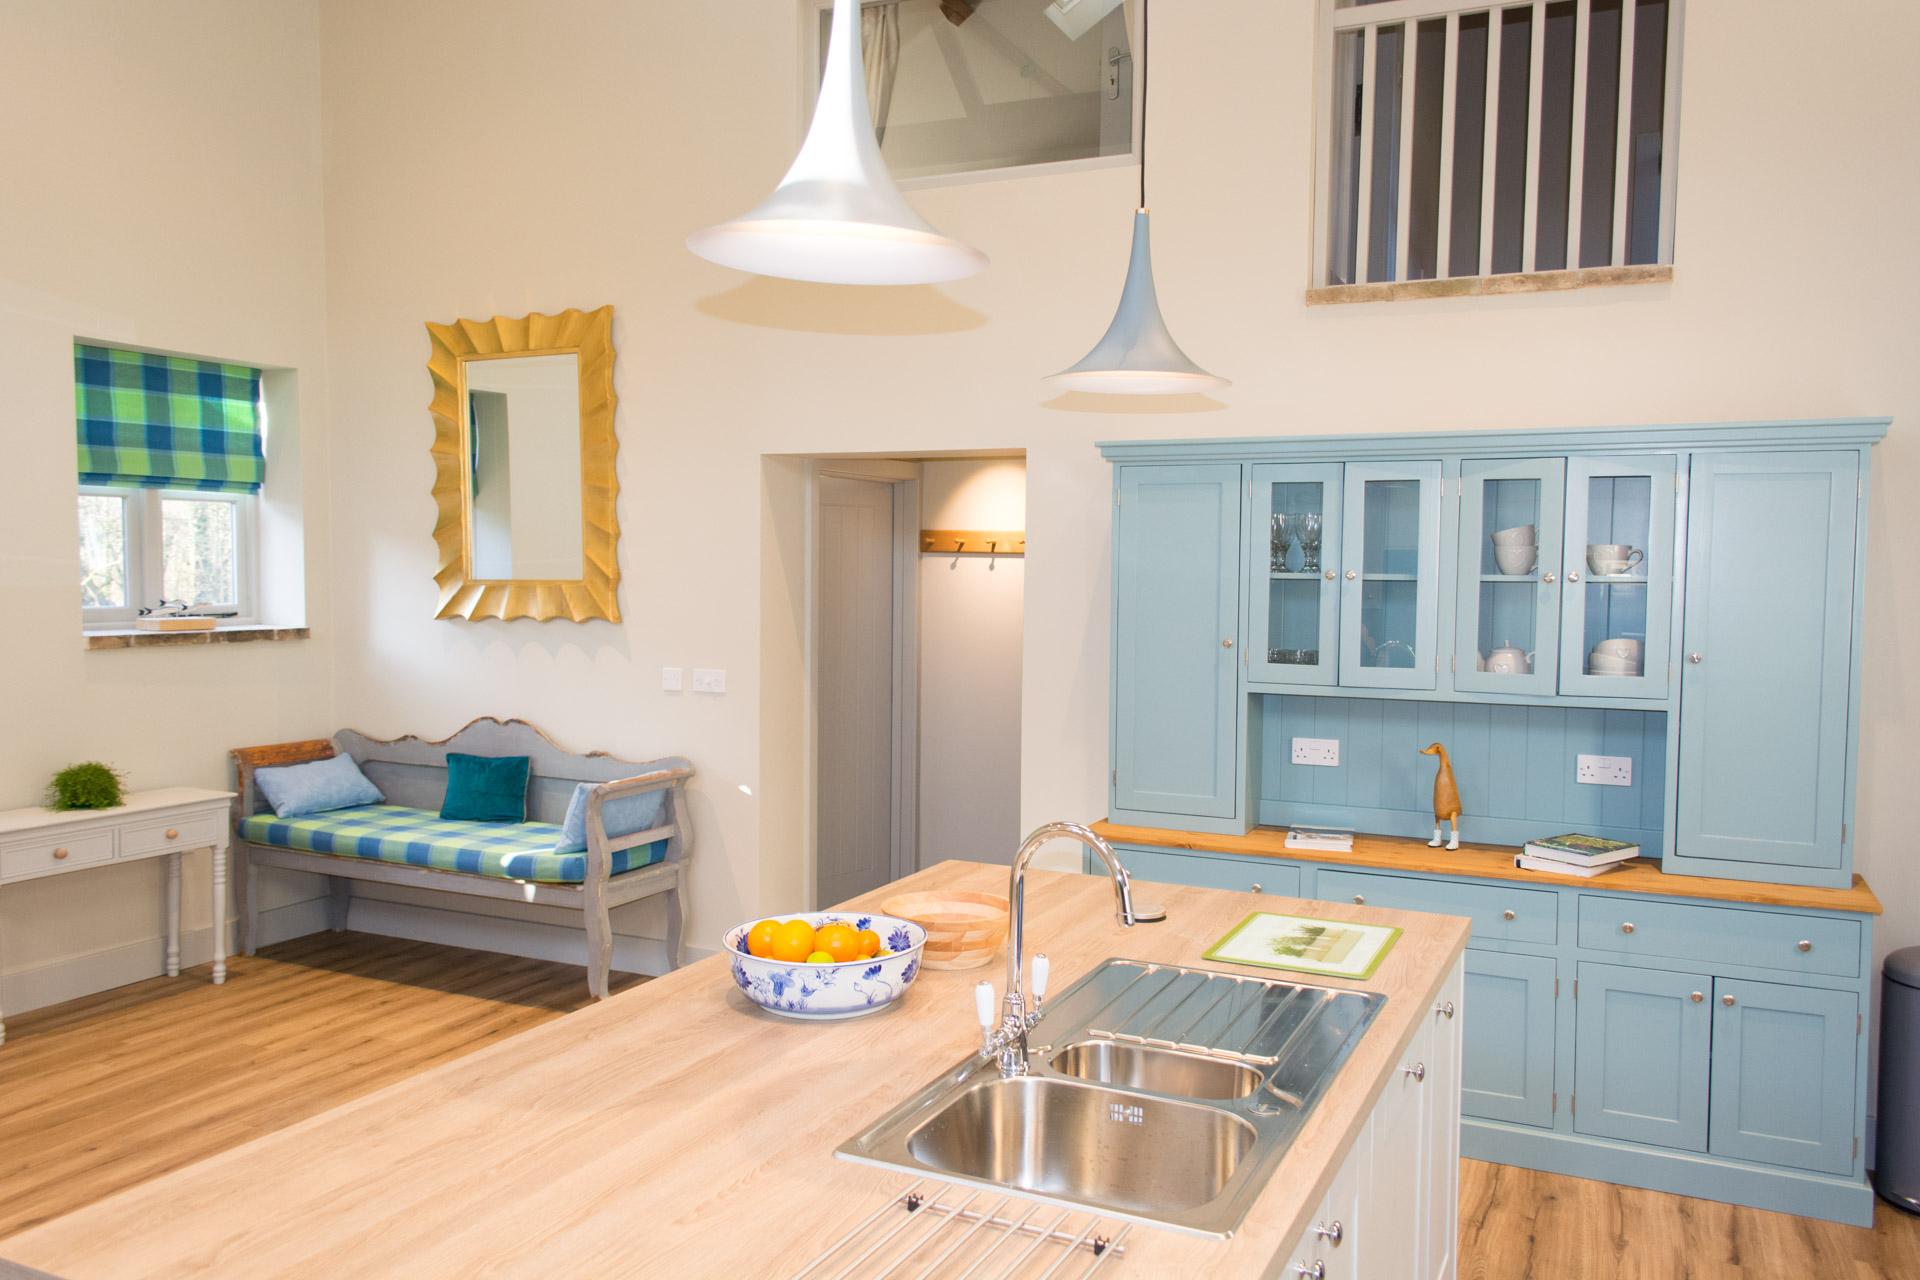 Holiday accommodation interior kitchen shot showing kitchen island and sink.